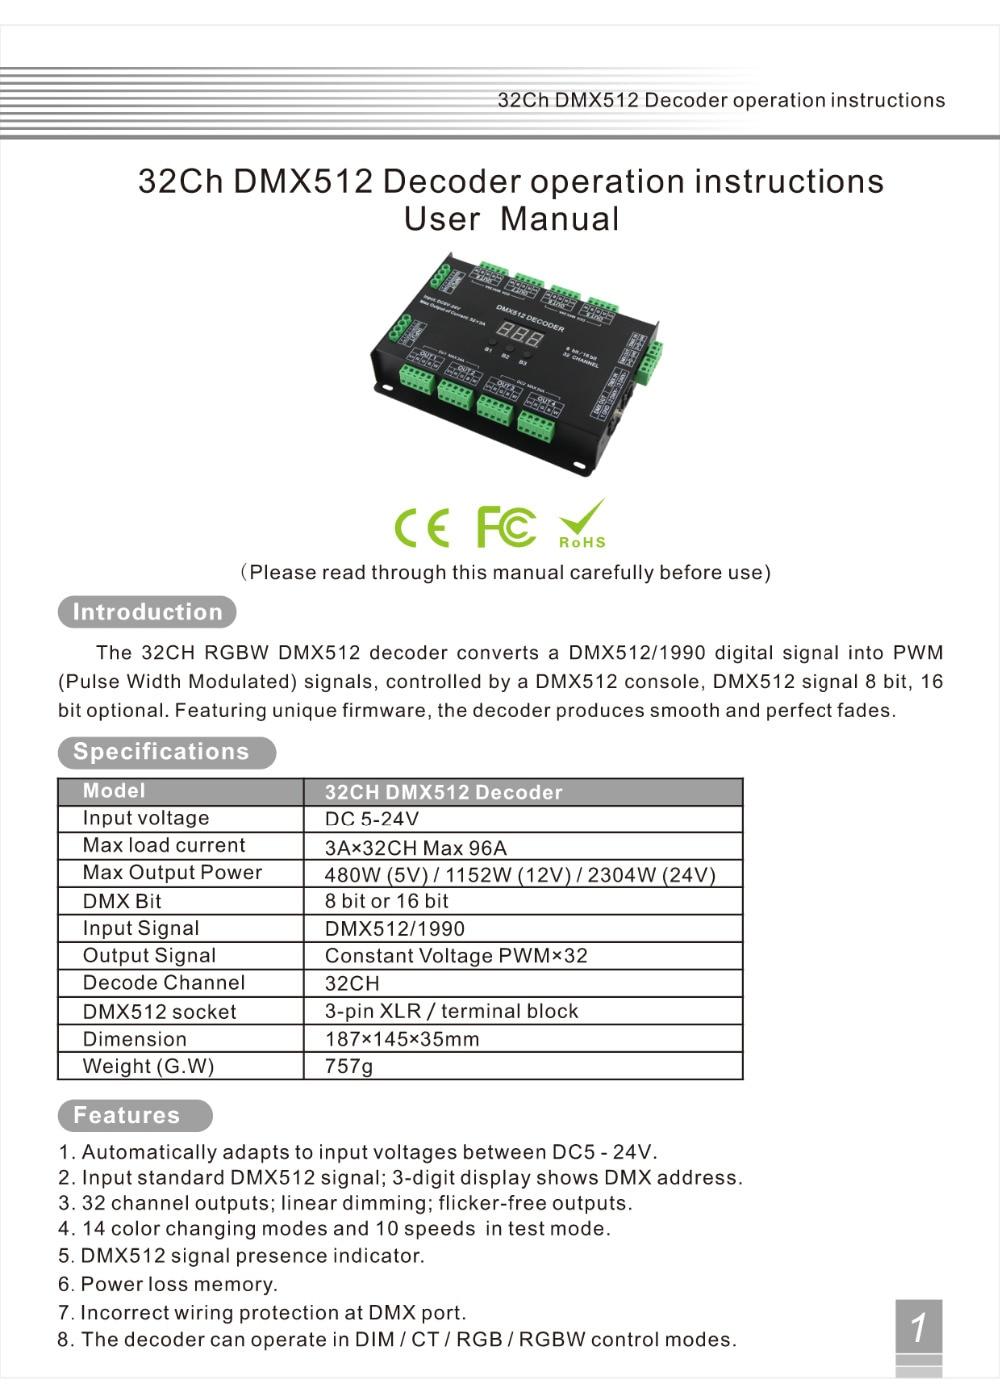 Aliexpress.com  Buy 32 Channel 96A RGBW DMX 512 LED Decoder Controller DMX Dimmer DC5 24V RGBW RGB LED light 8 Bit/16 Bit from Reliable dmx 512 suppliers ...  sc 1 st  AliExpress.com : dmx xlr wiring - yogabreezes.com